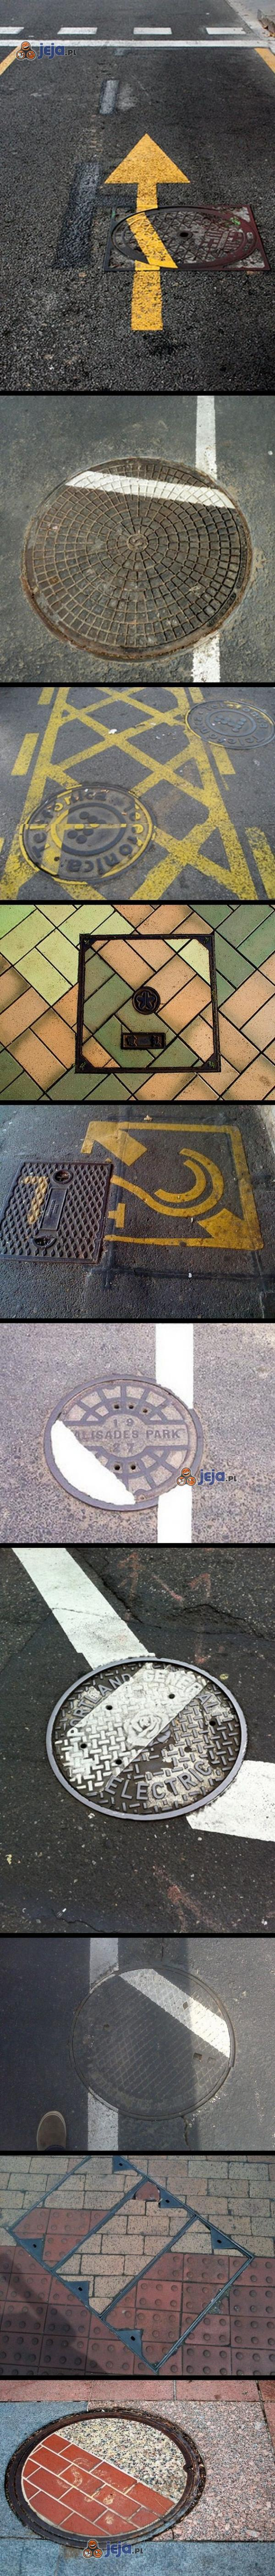 Trollowanie na ulicy